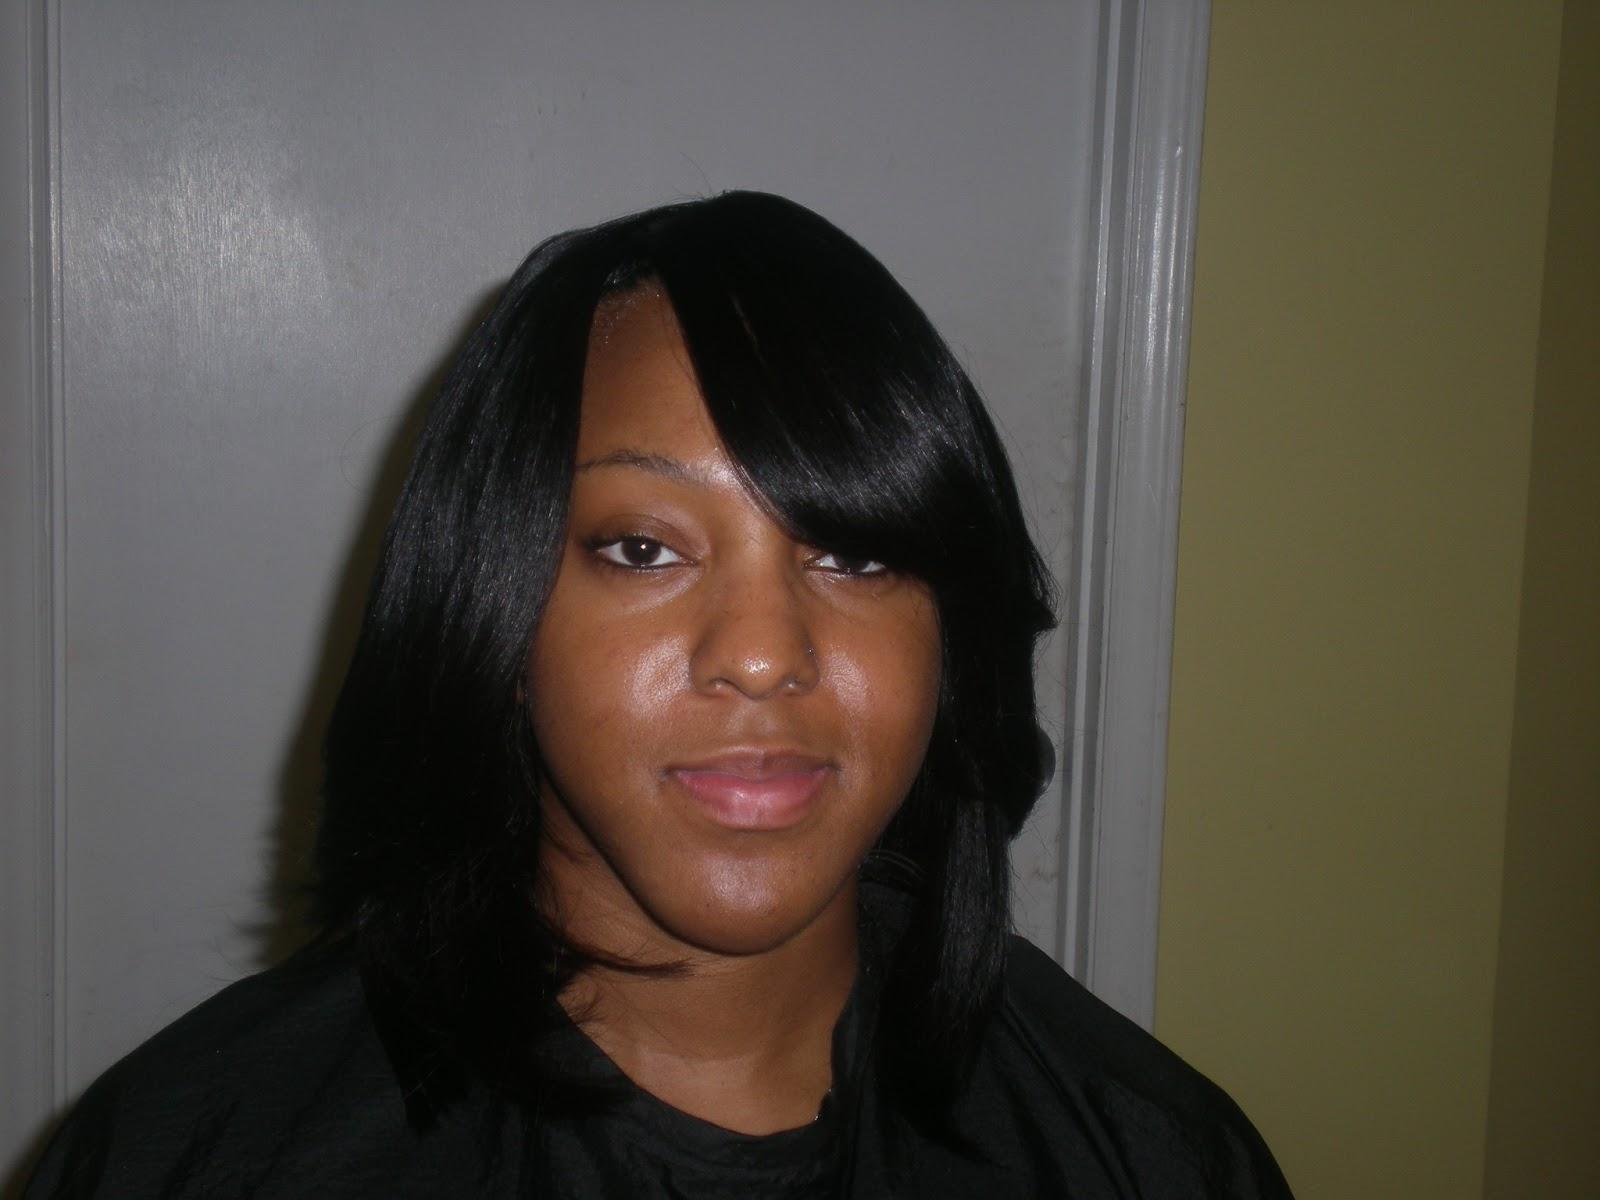 50 Dollar Hair Weave Houston 119